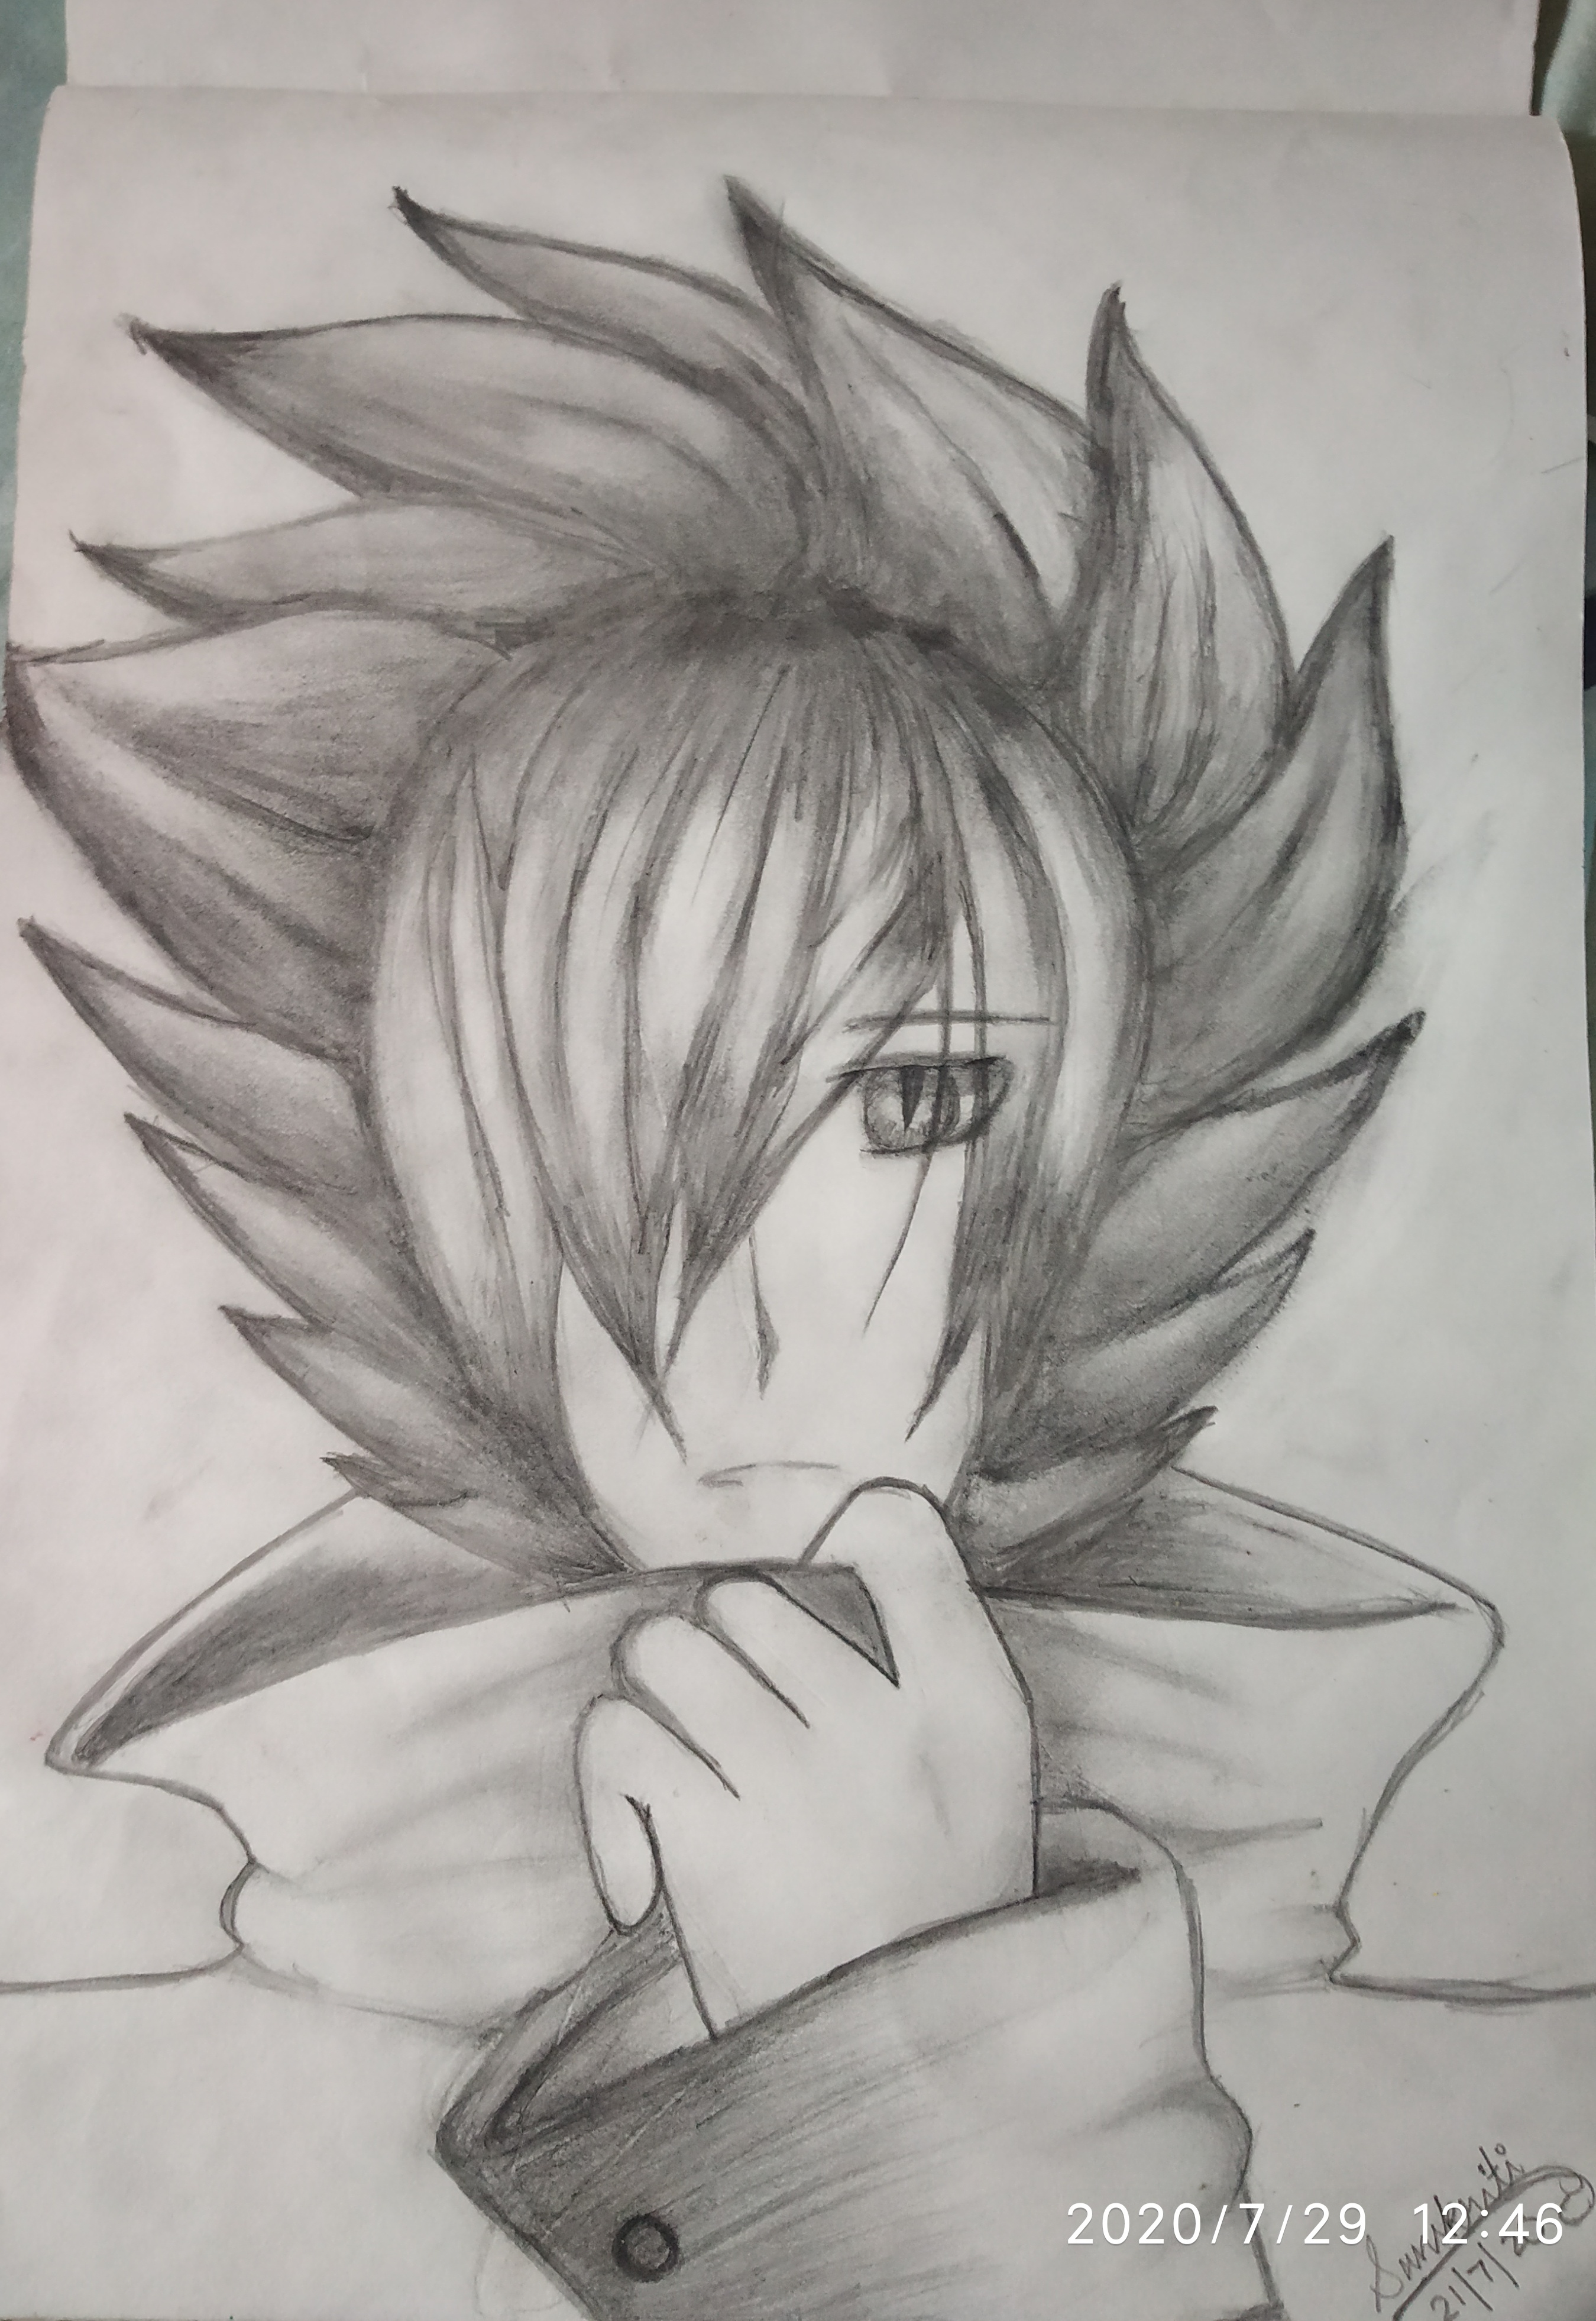 Sanskriti's Drawing Of Anime